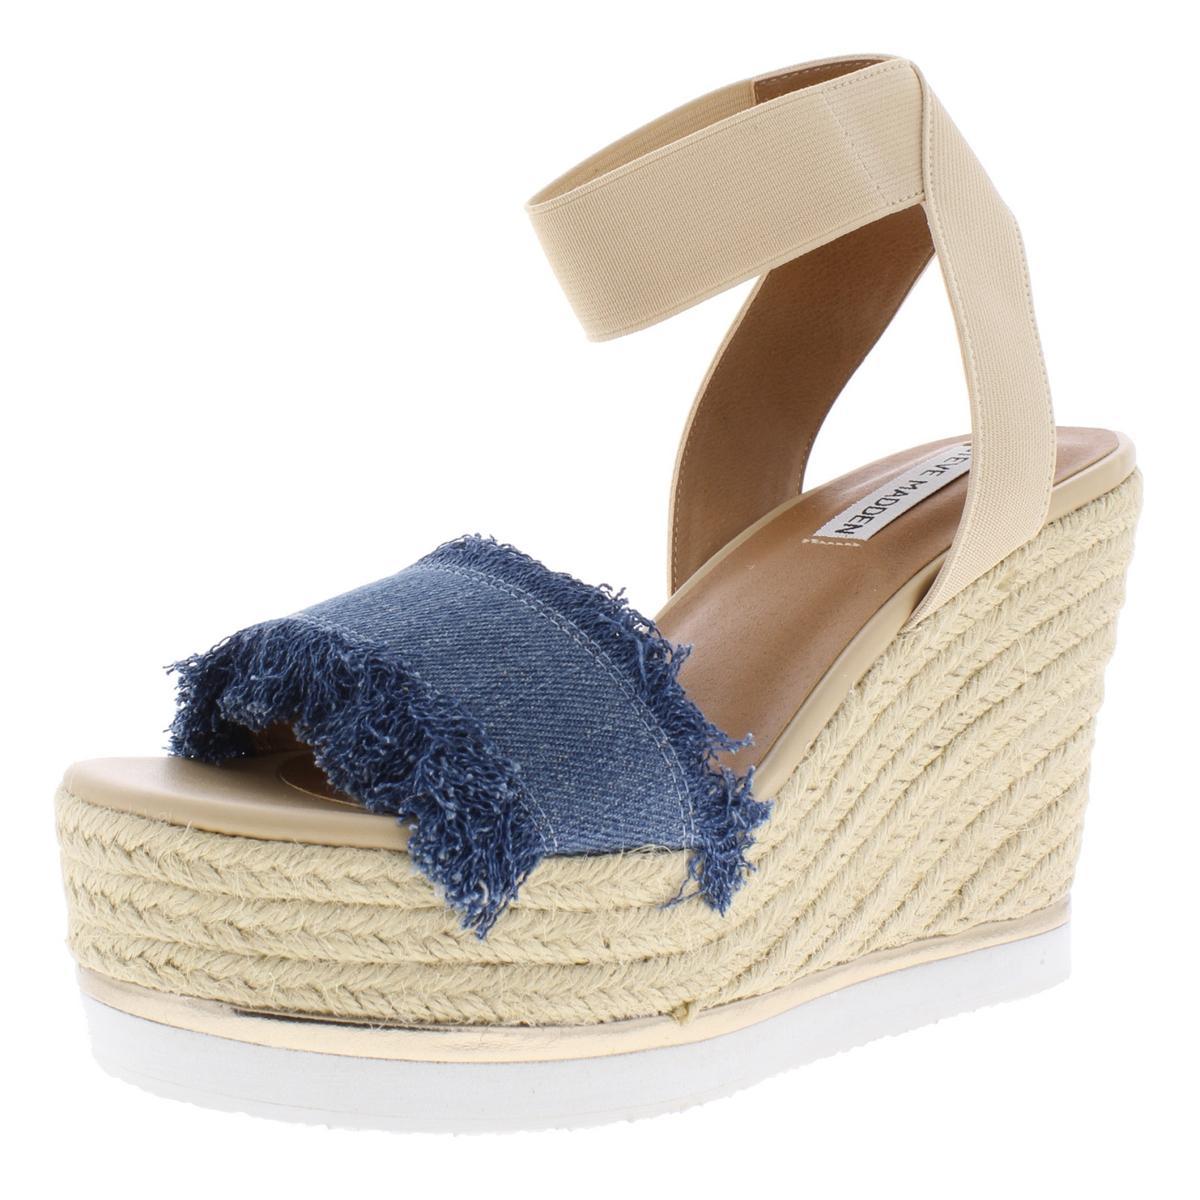 133bfdc0dde Steve Madden Womens Venus Fringe Metallic Trim Wedge Sandals Shoes ...